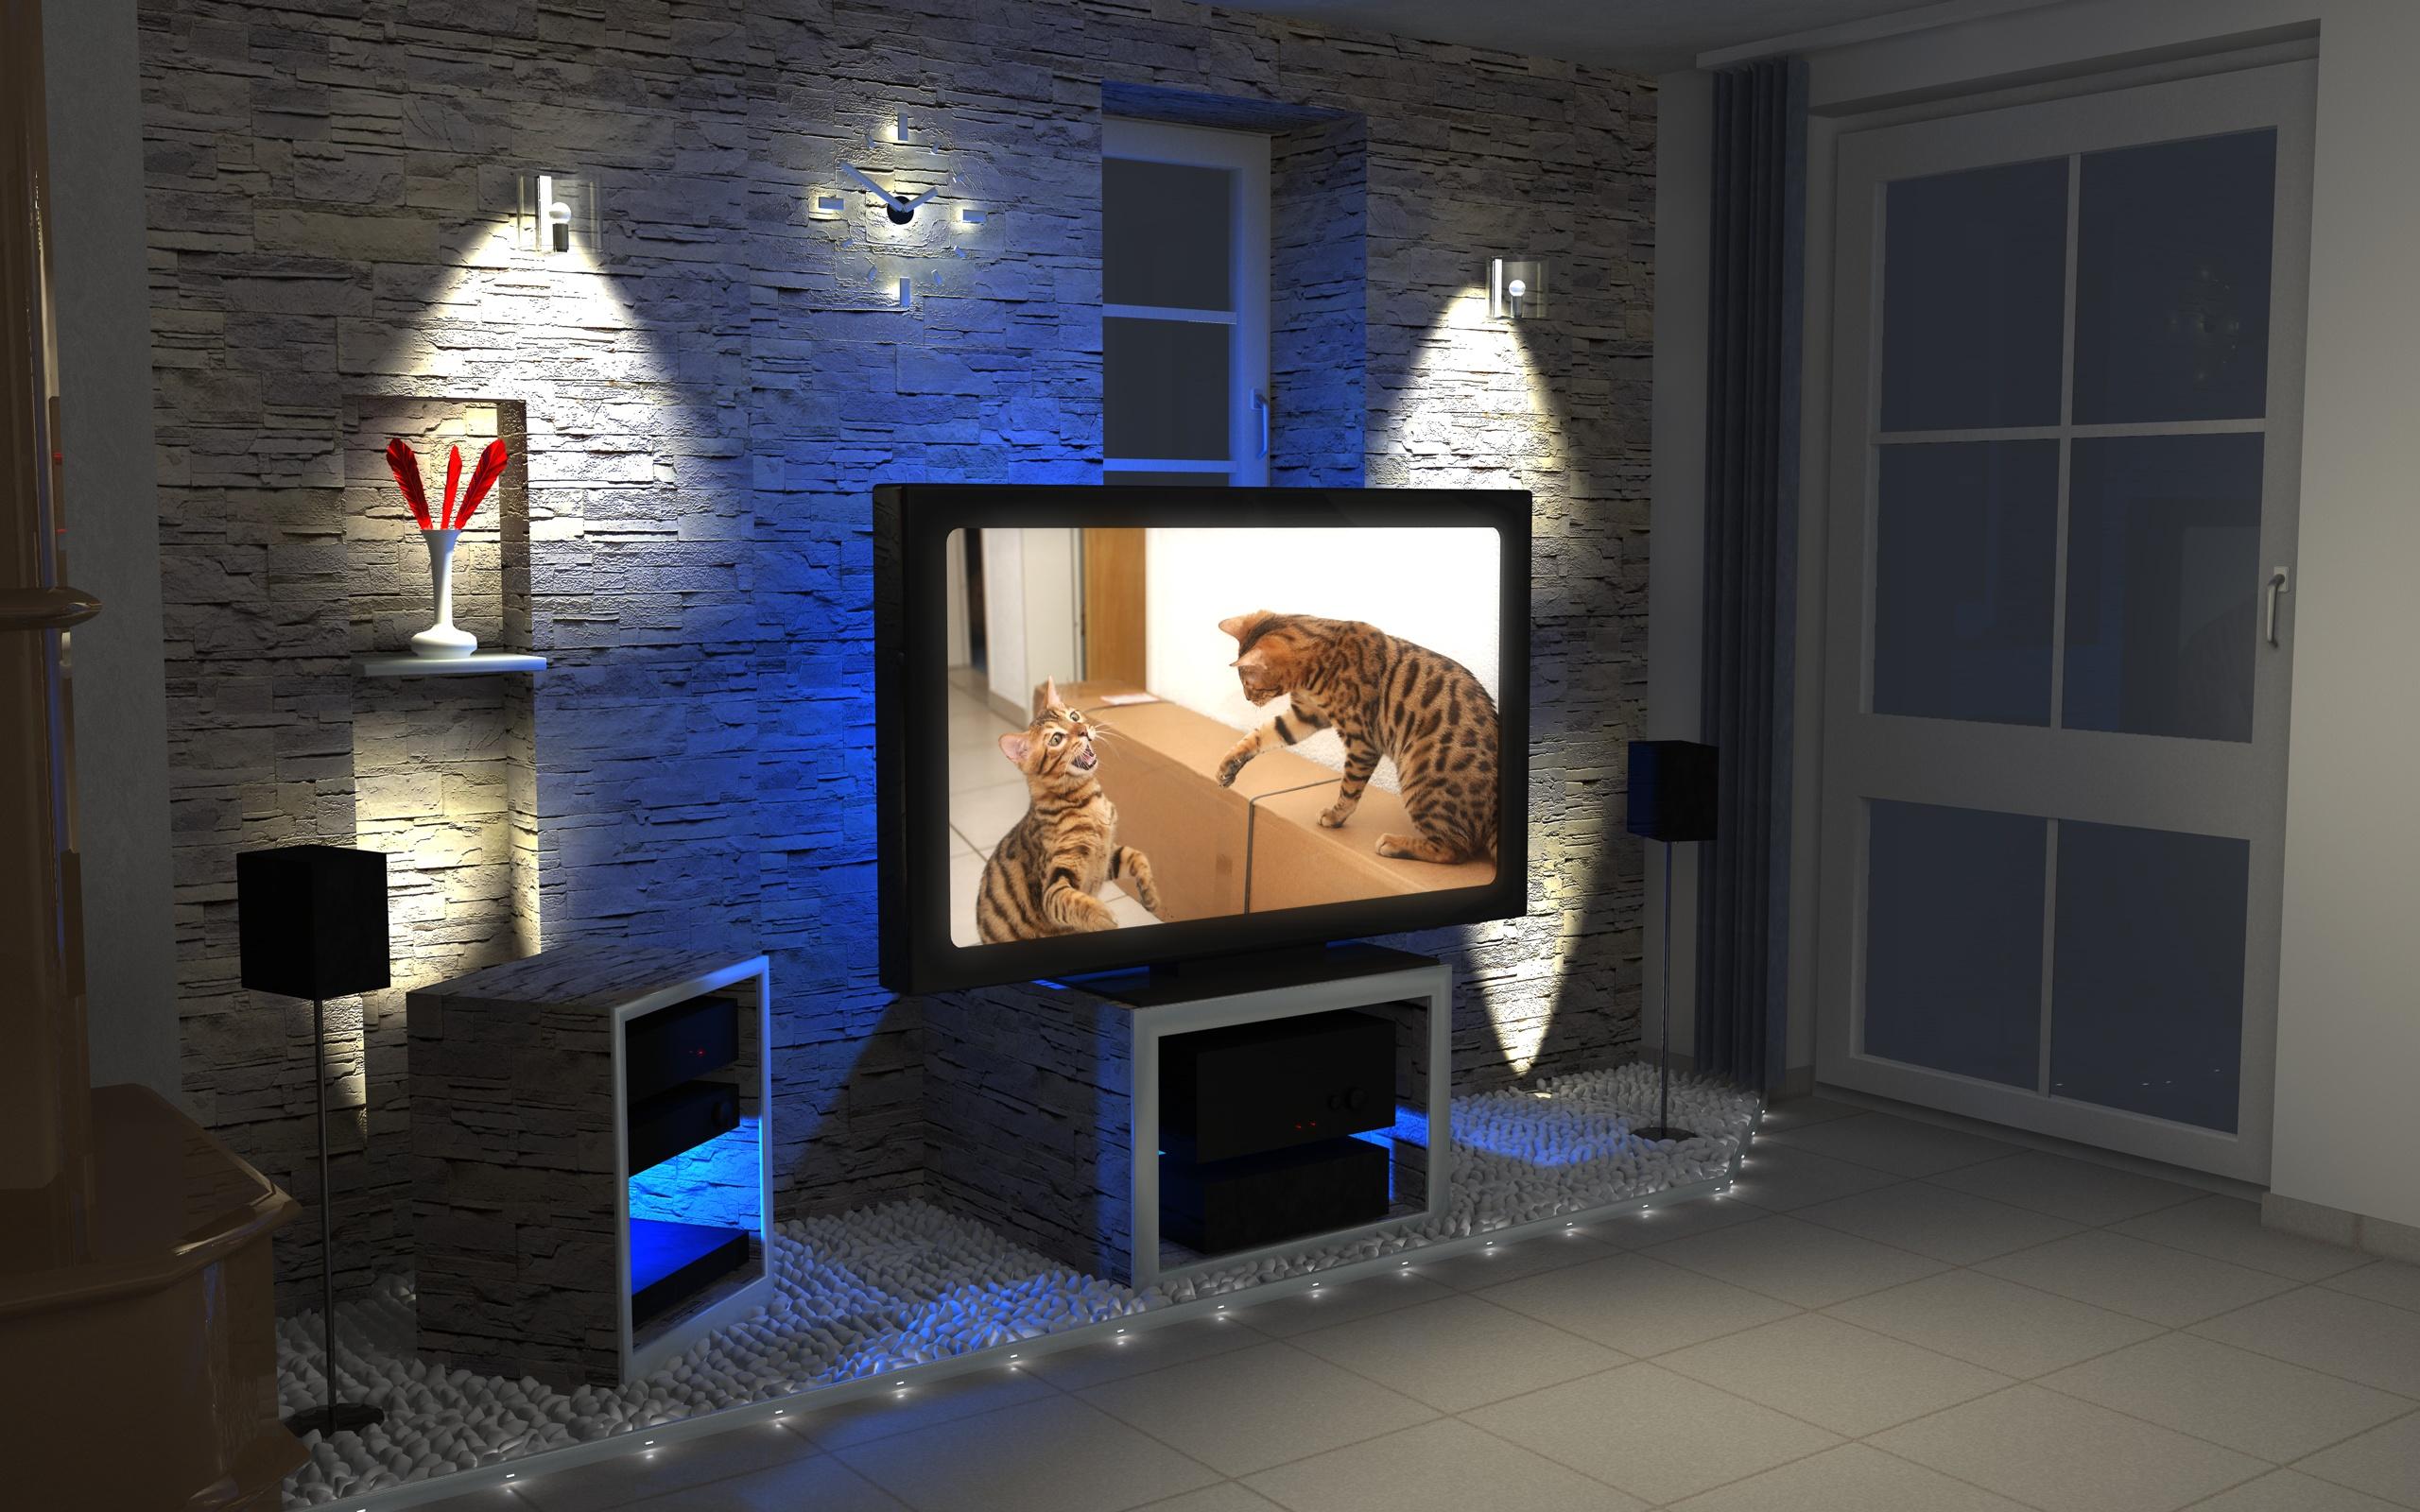 2153AA2560 LED Baterky Iarovky Psy Reflektory Trubice RGB 1600 4170 Licht Ideen Wohnzimmer Bilder